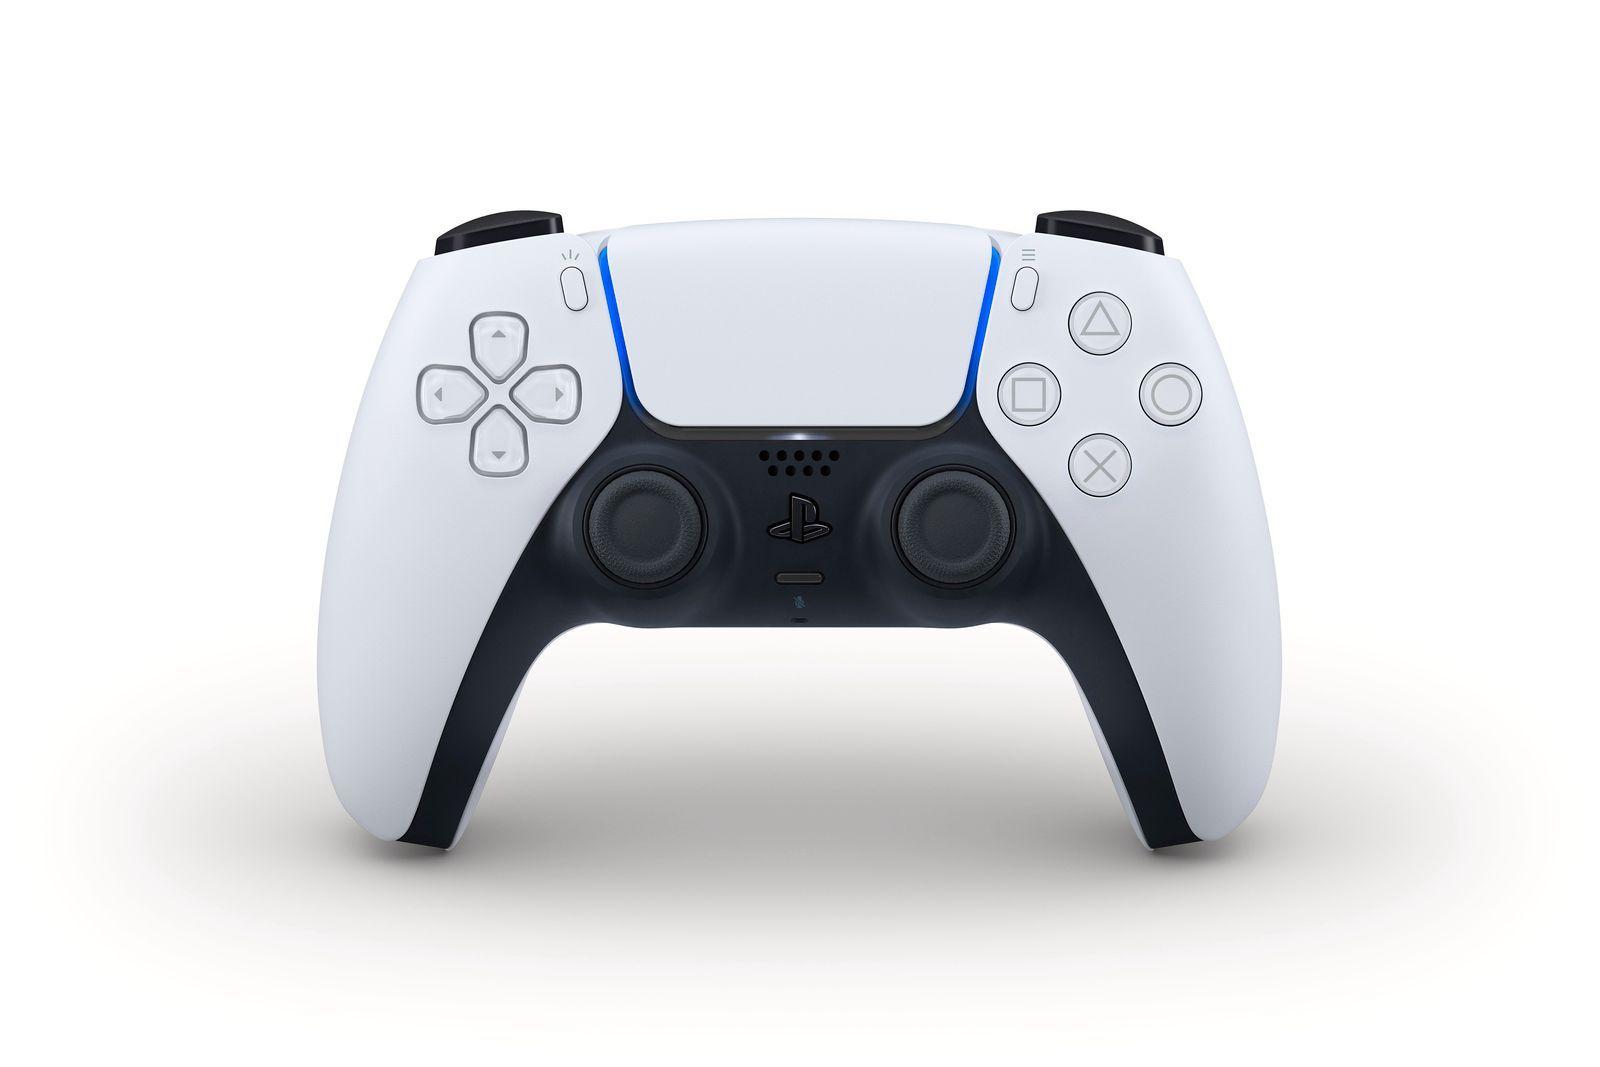 Slik ser PlayStation 5-kontrollen ut.